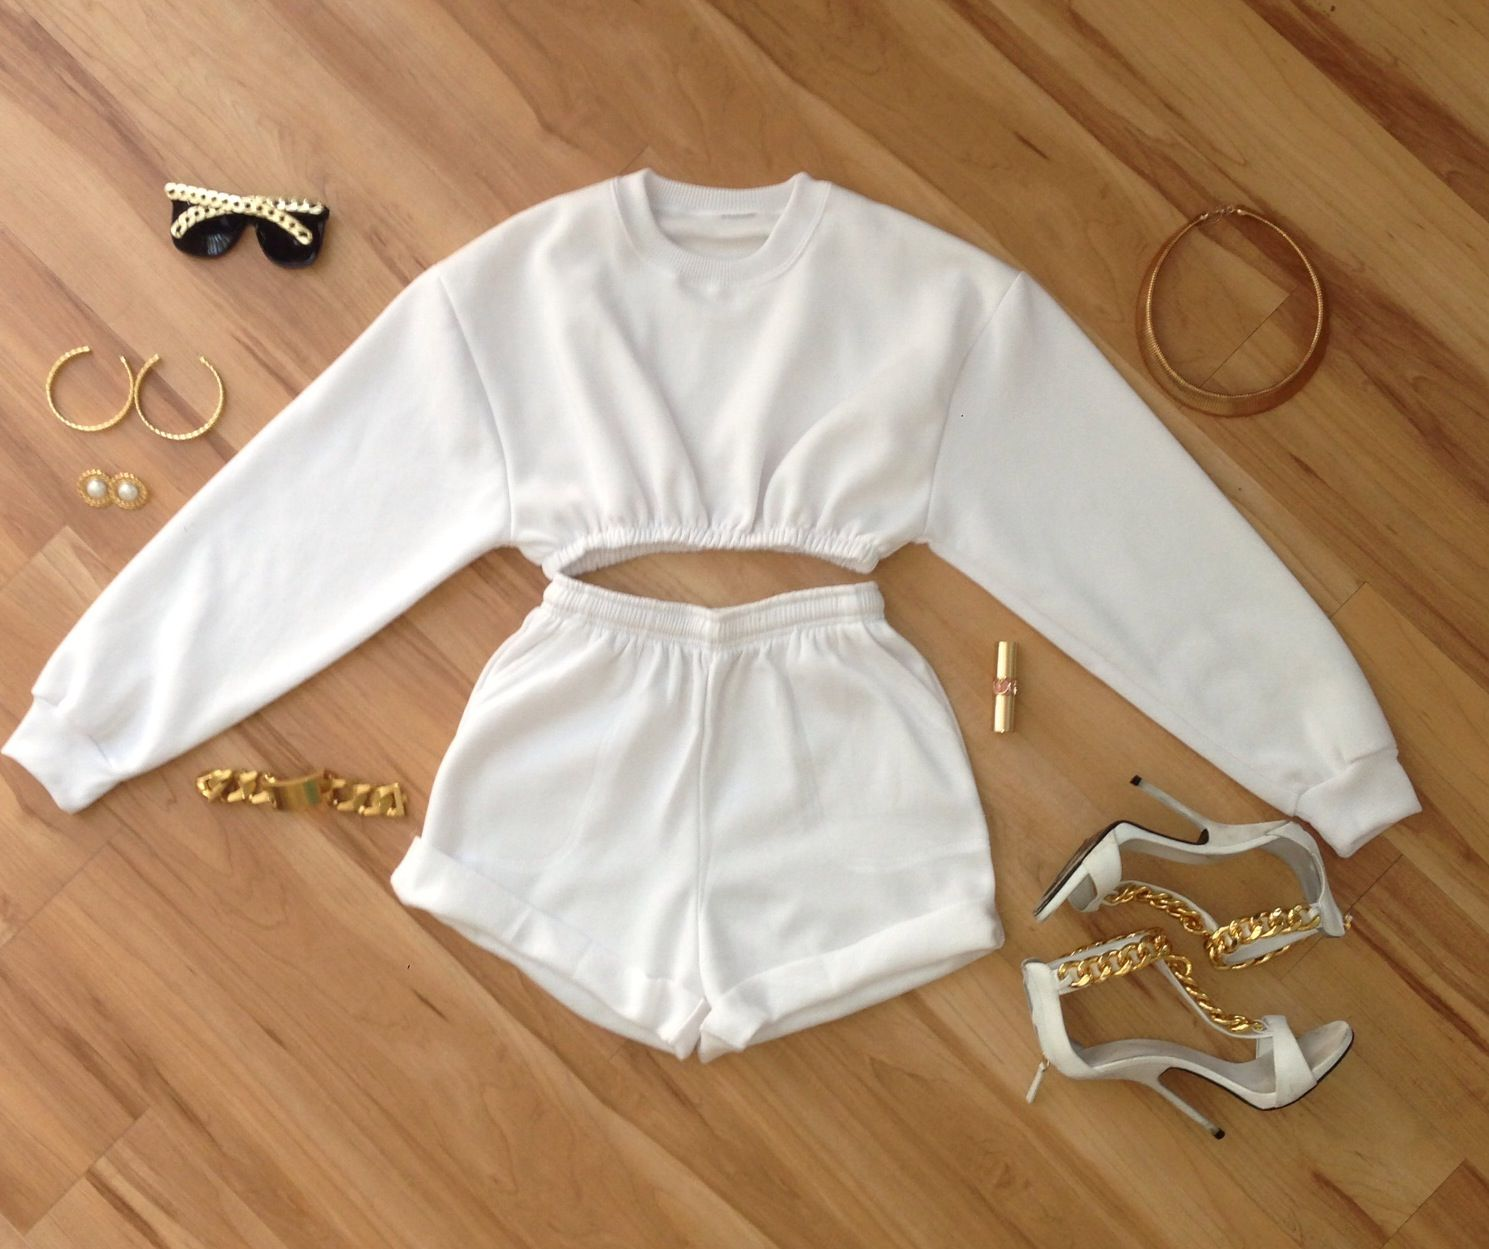 White hot! Sweat suit set from sosorella.com | N I G H T O U T ...